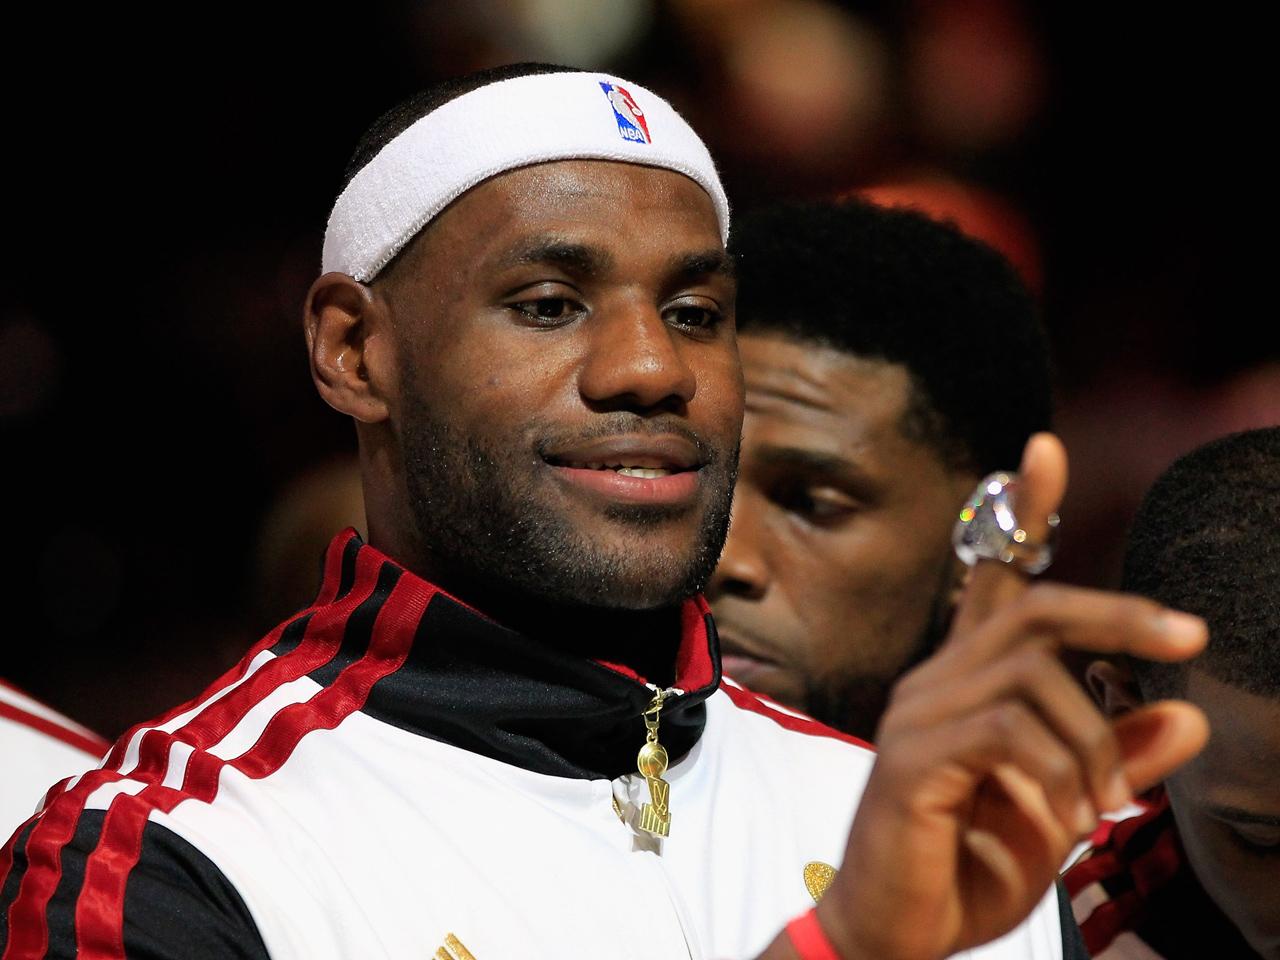 Heat get rings, beat Celtics in NBA season opener - CBS News